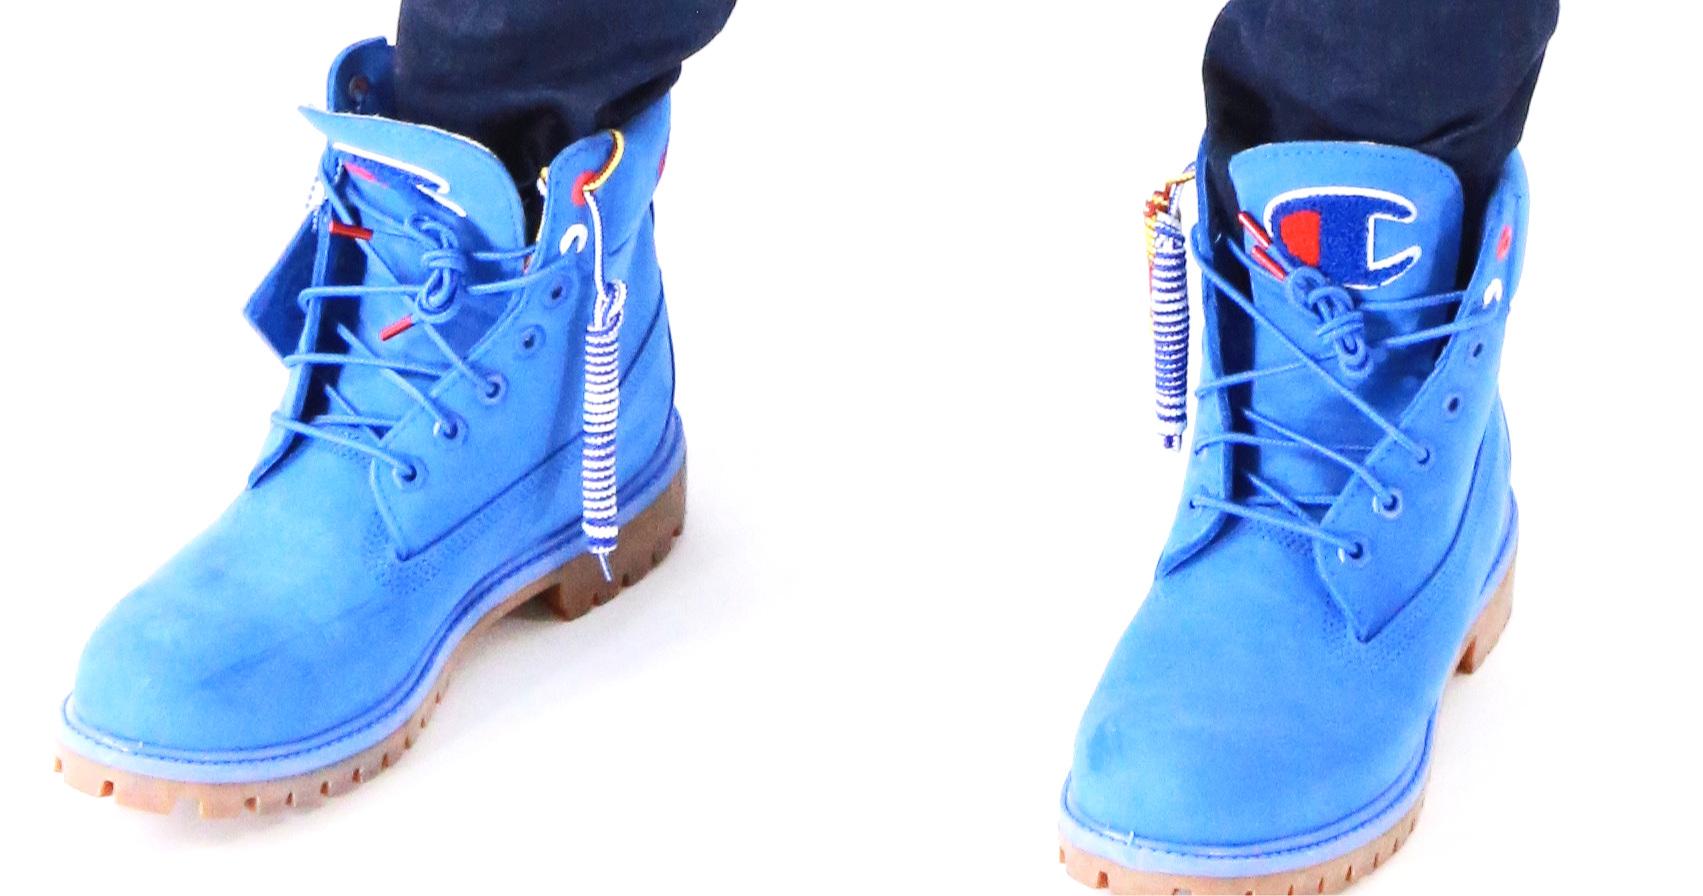 Champion & Timberland collaboration boots